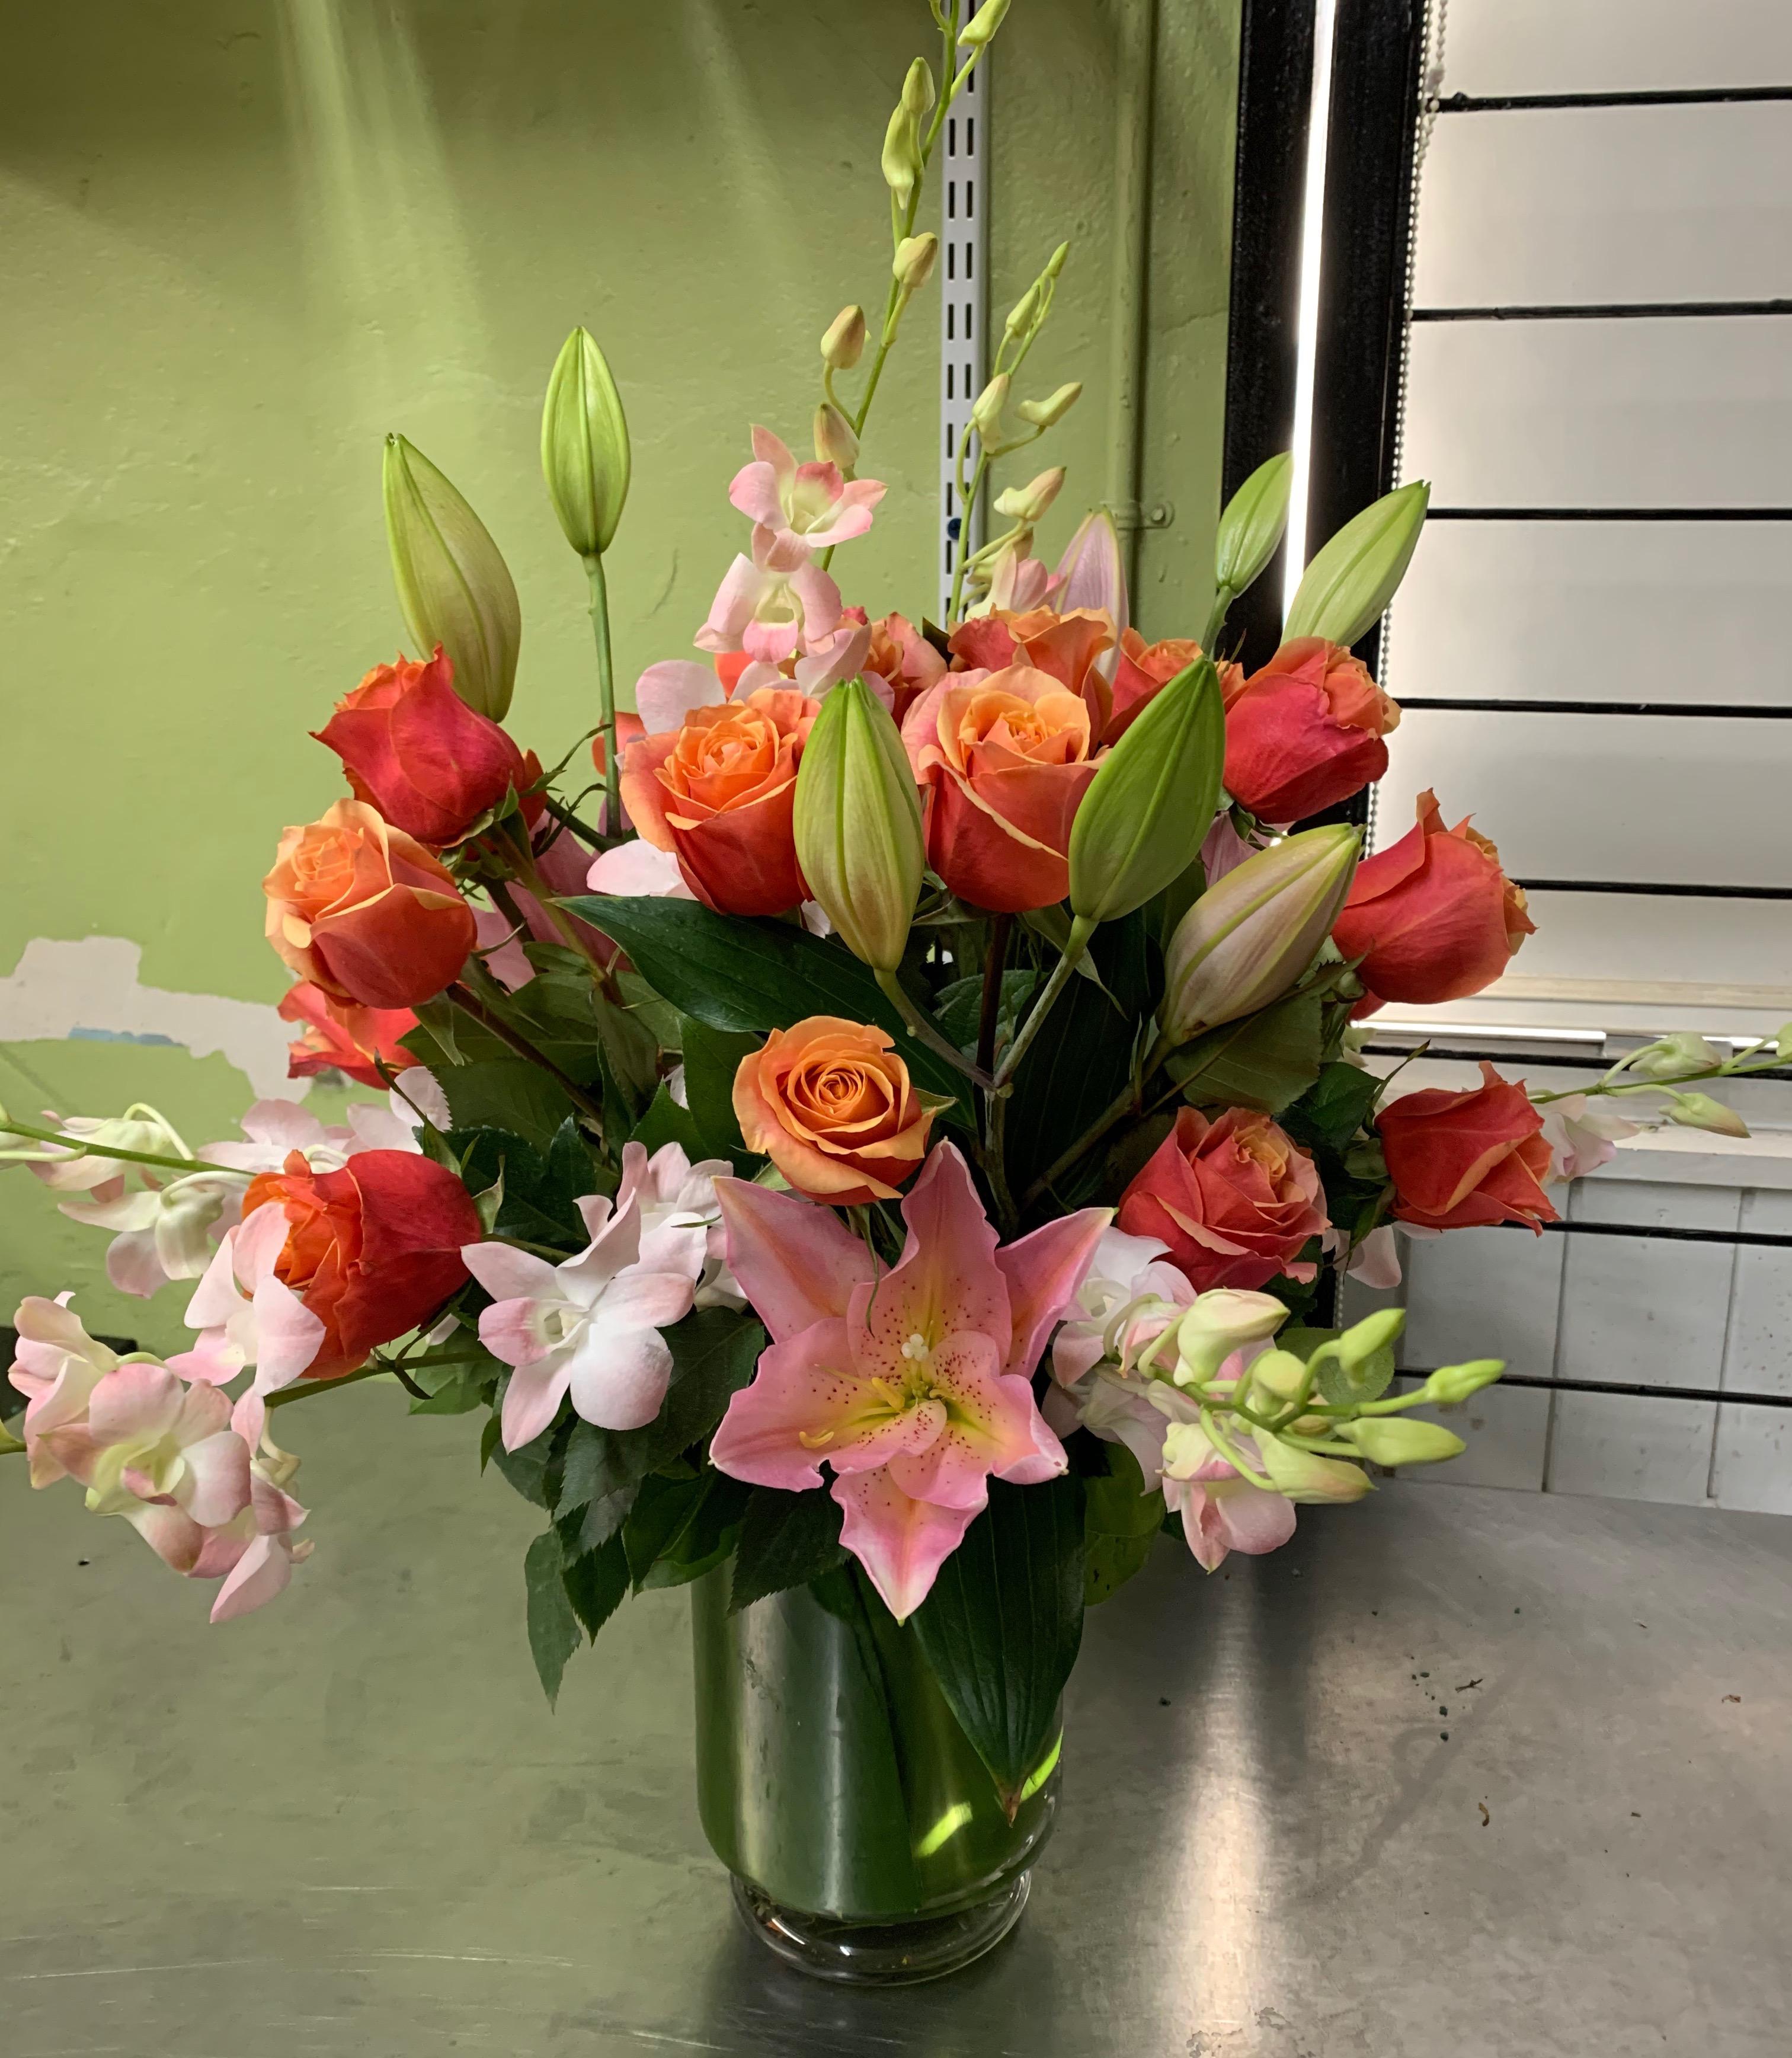 Delicate Pinkish Floral Arrangement Velene's Floral